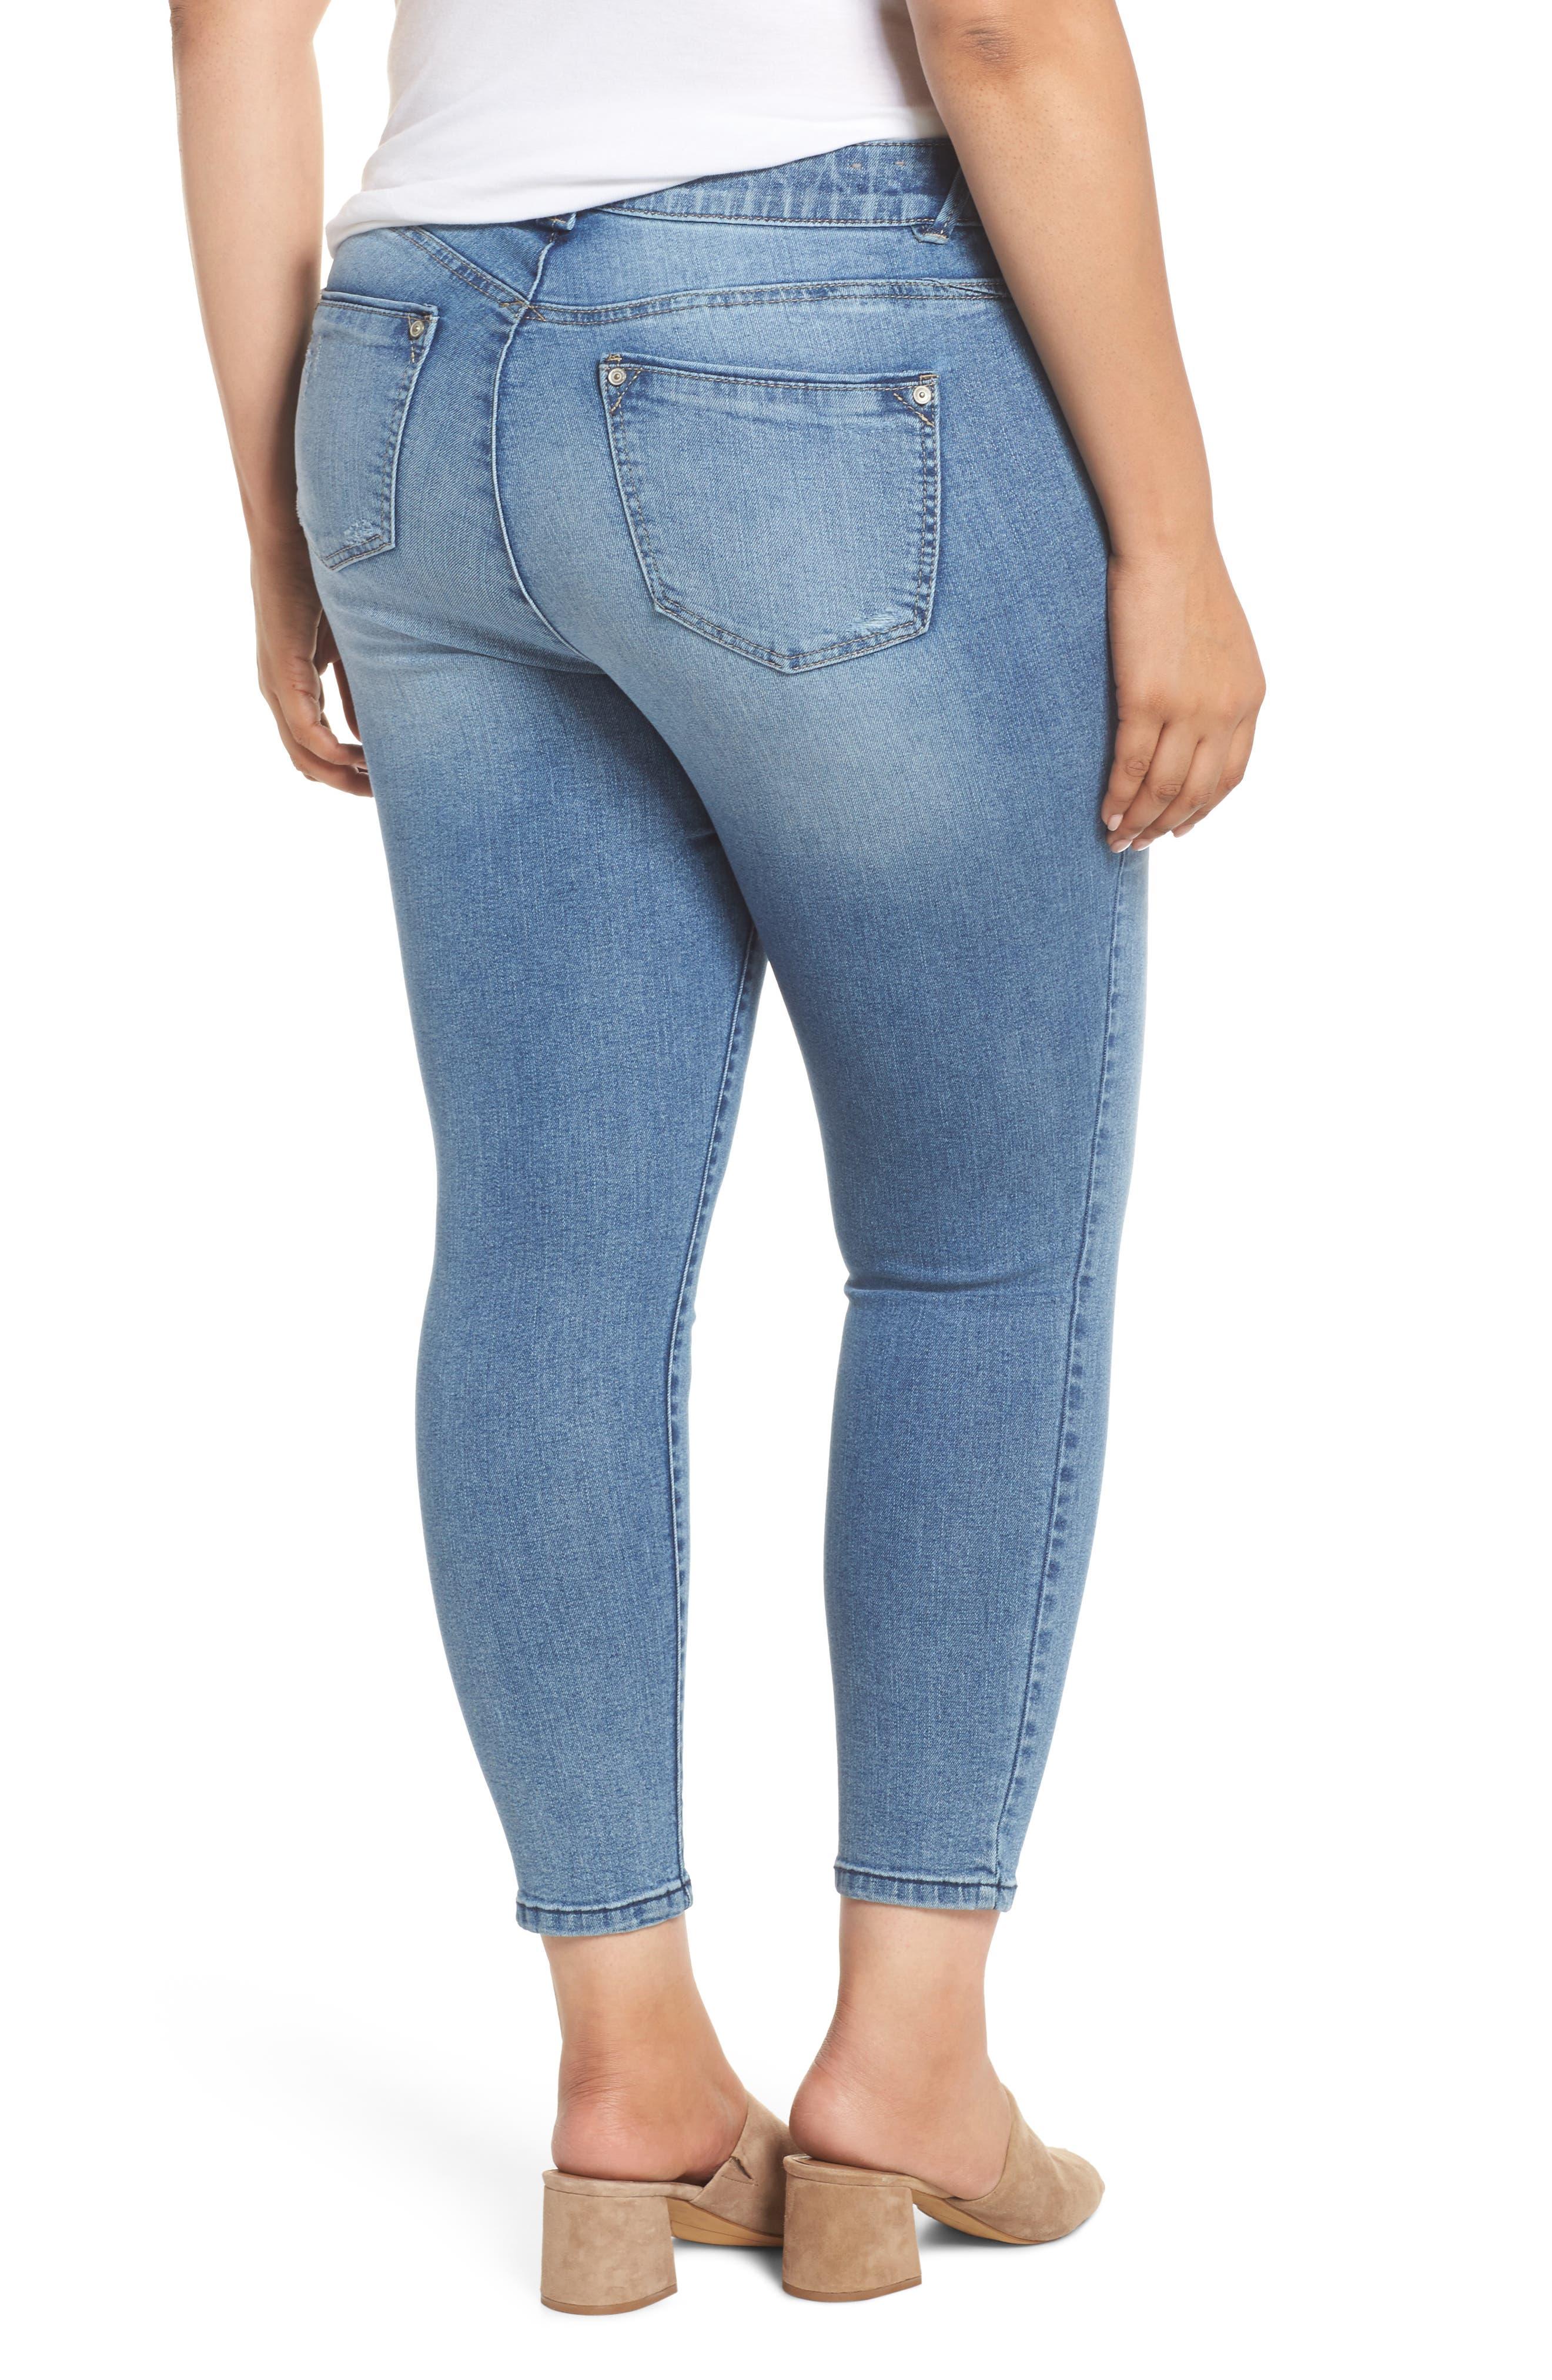 WIT & WISDOM,                             Ab-solution Stretch Ankle Skimmer Jeans,                             Alternate thumbnail 2, color,                             LIGHT BLUE